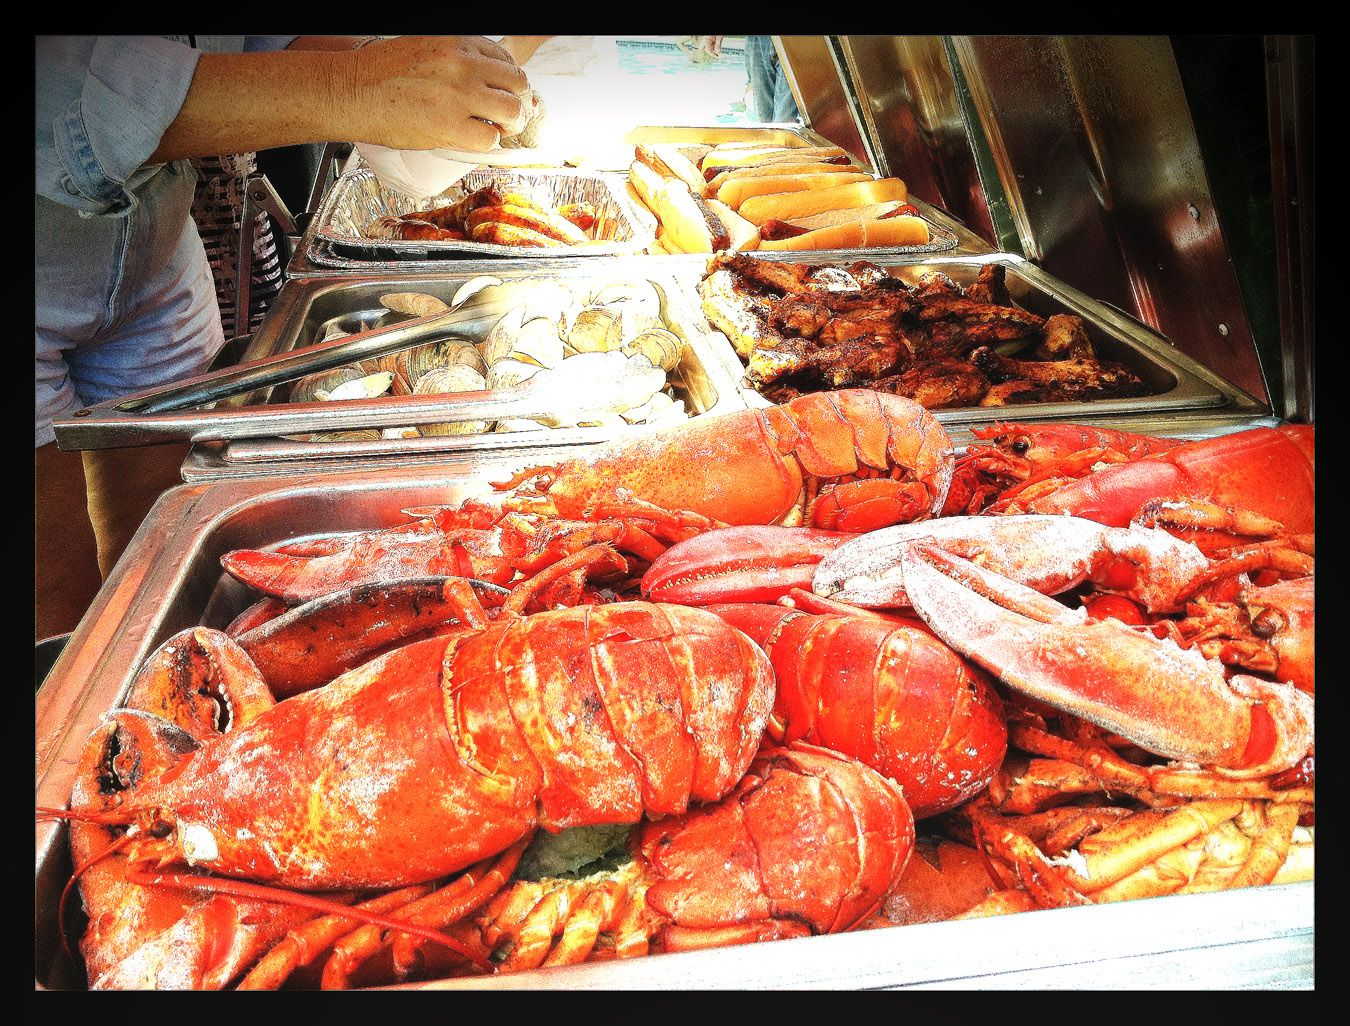 Clam bake, King crab legs, Bbq company